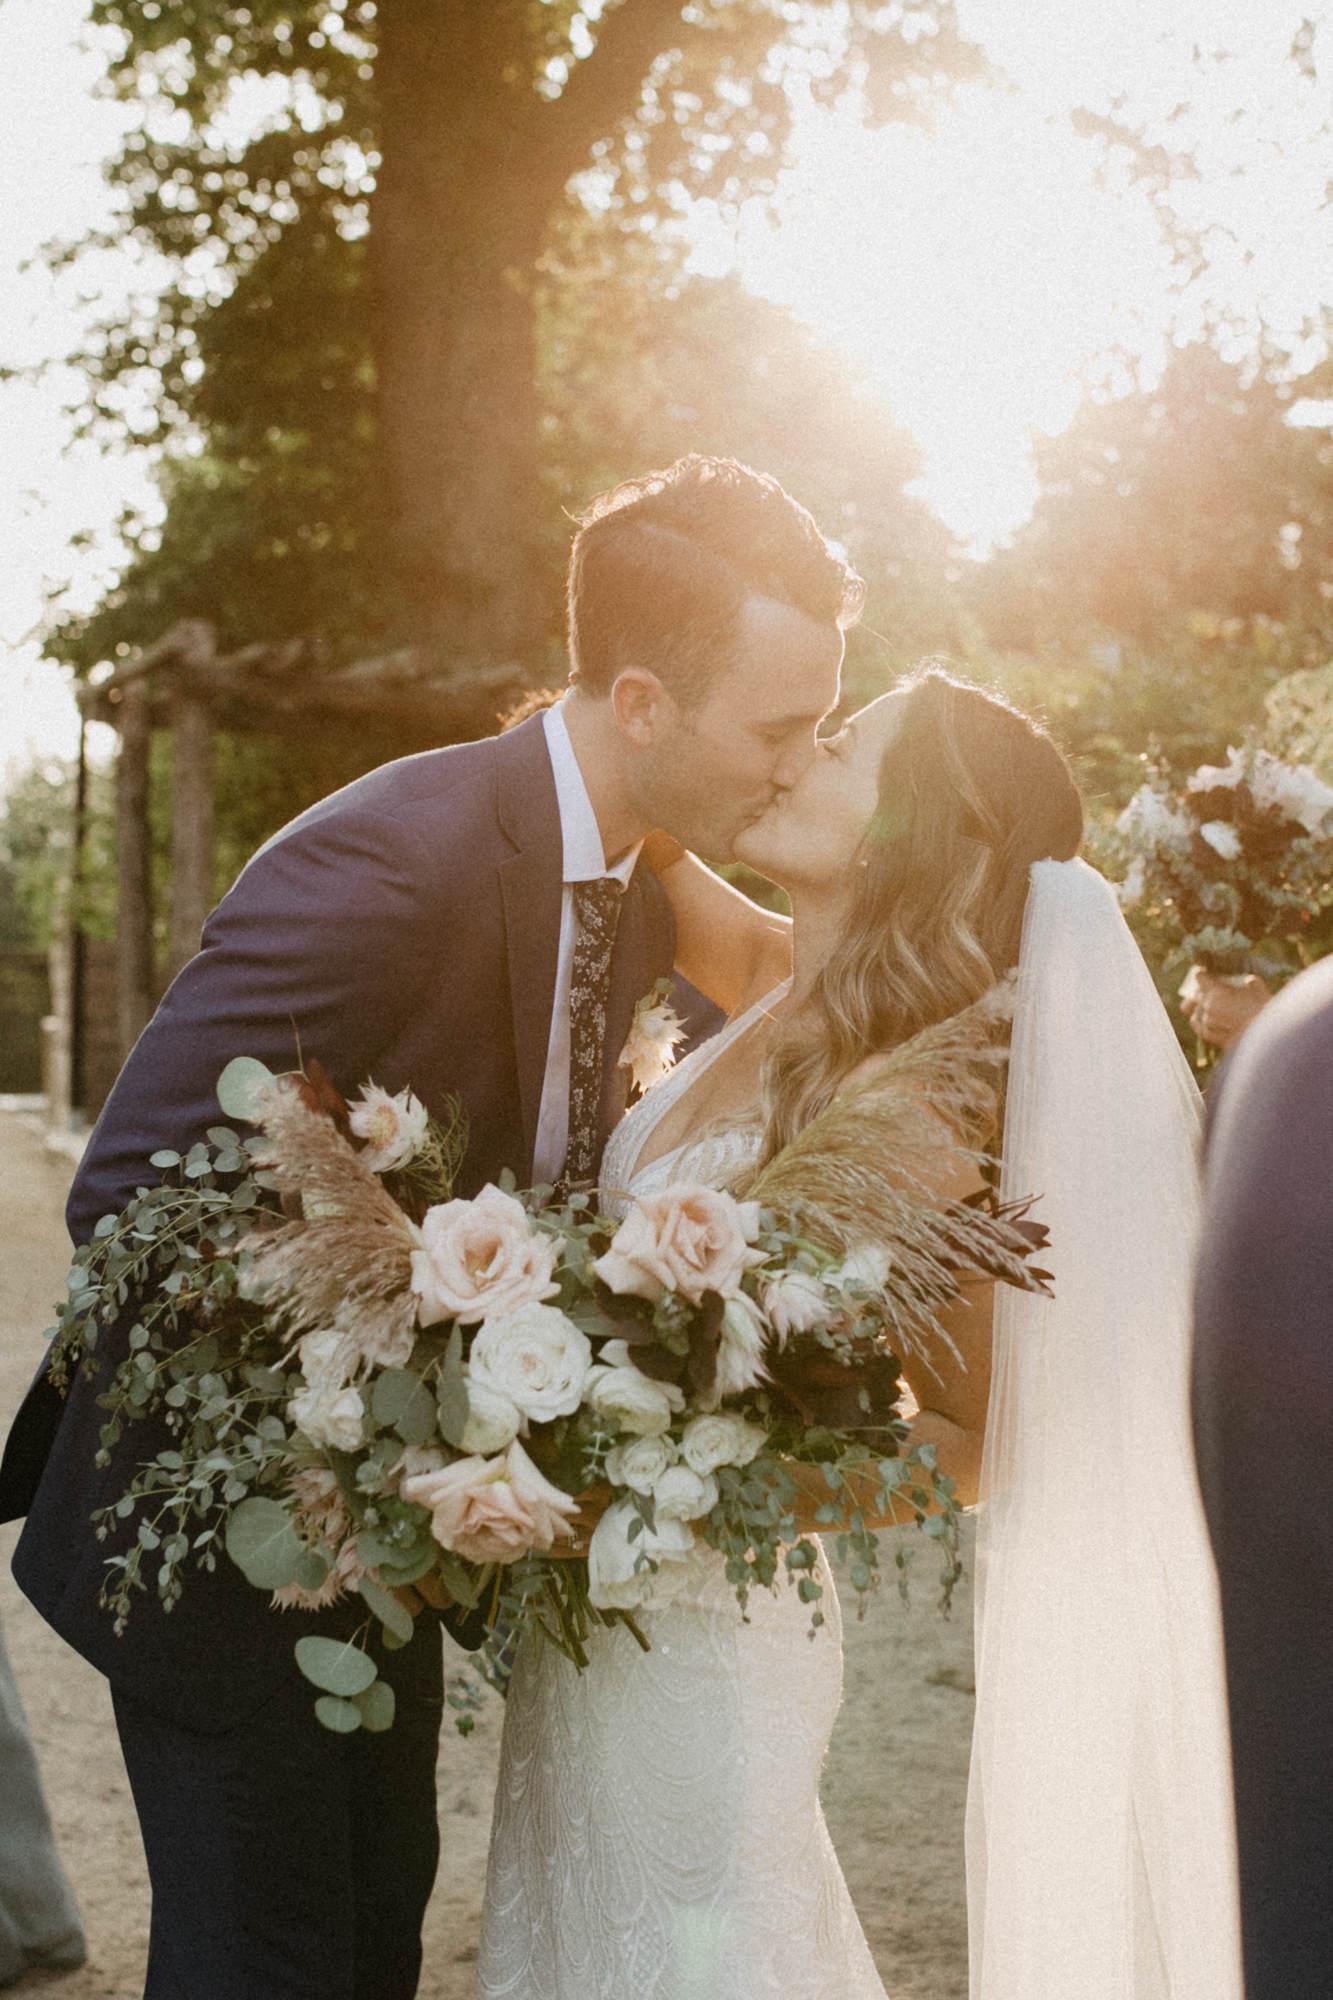 terrain-events-wedding-photographer-41.jpg